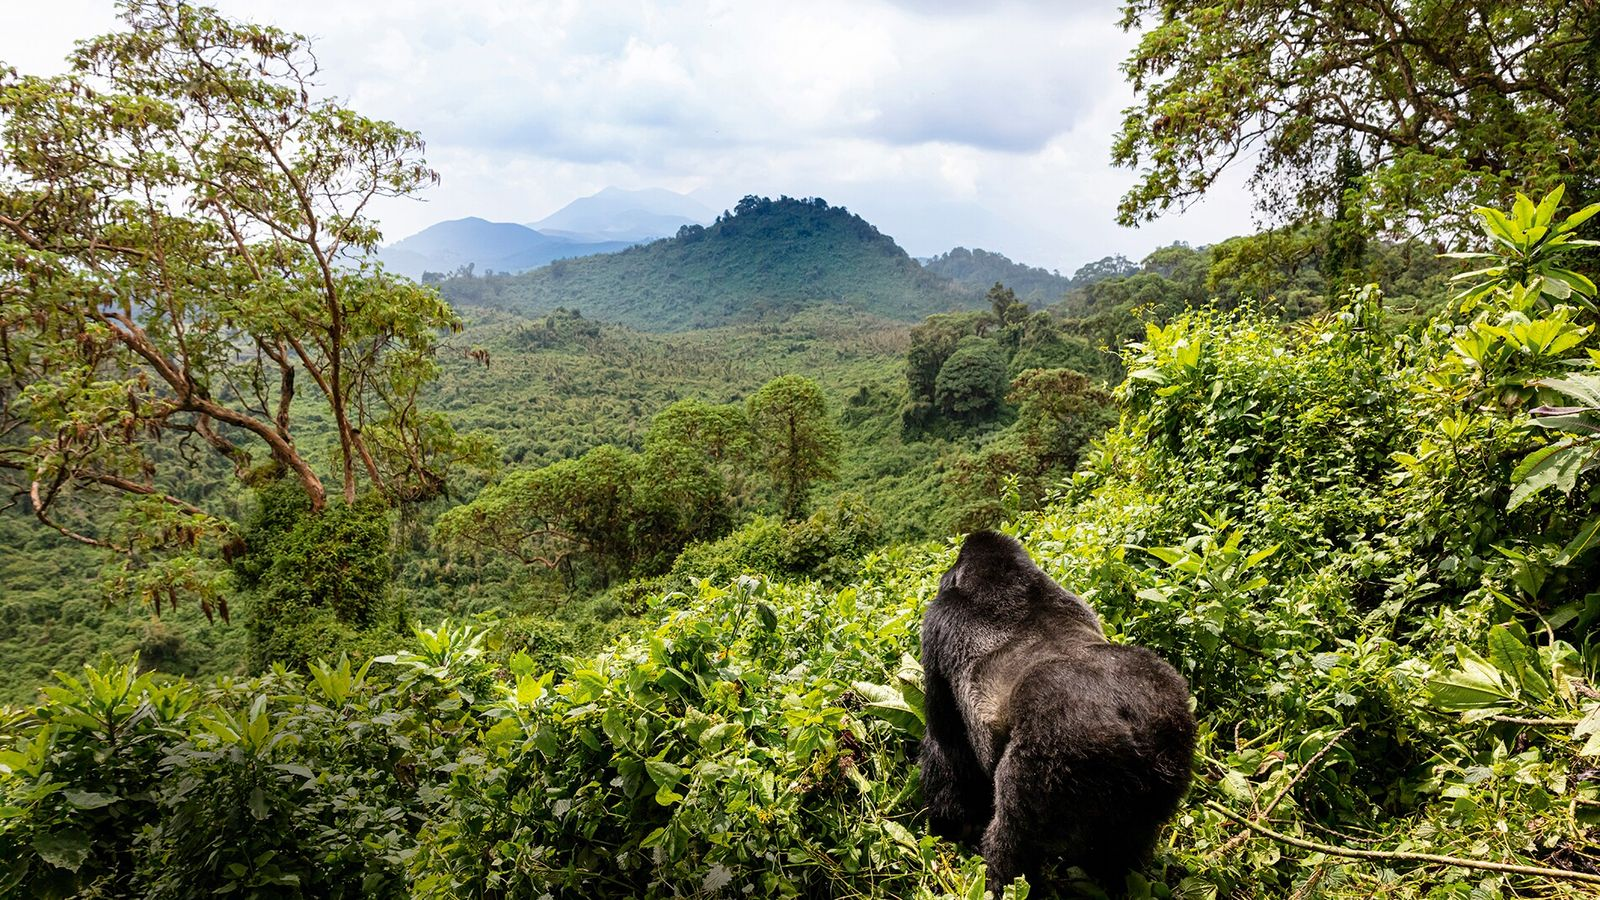 Mountain gorilla in Rwanda Volcanoes National Park.